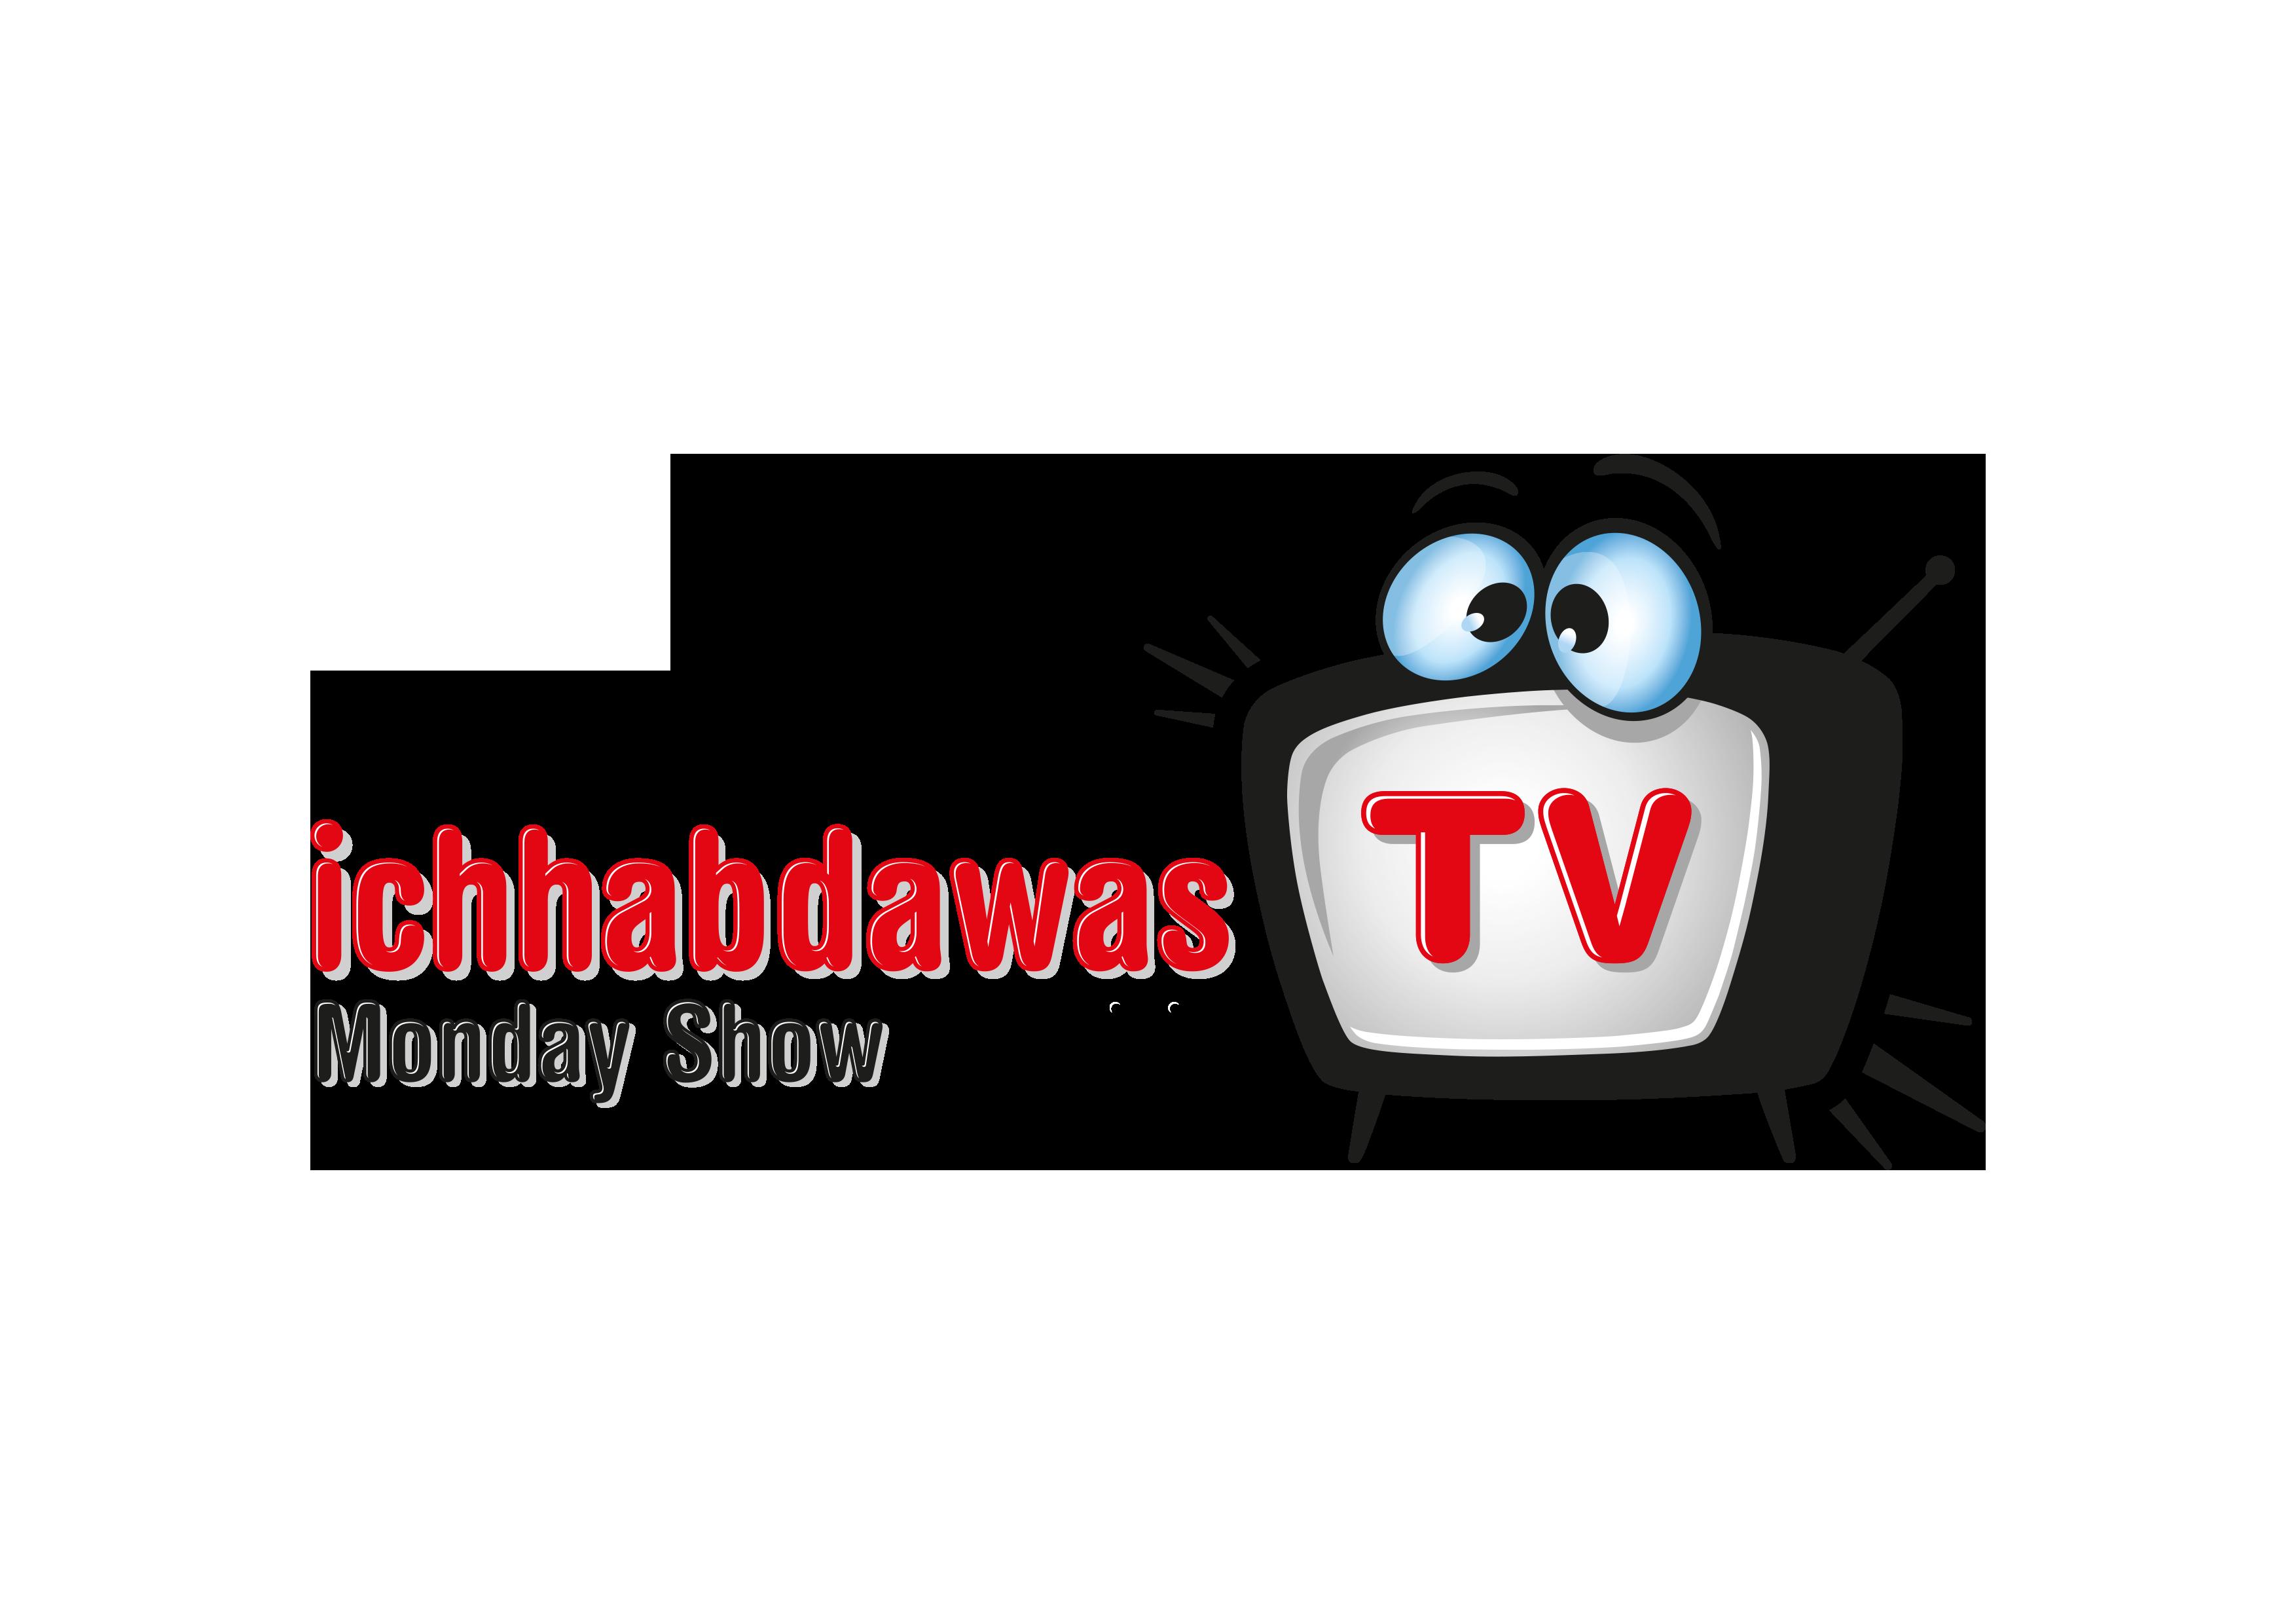 ichhabdawasTV Monday Show Logo